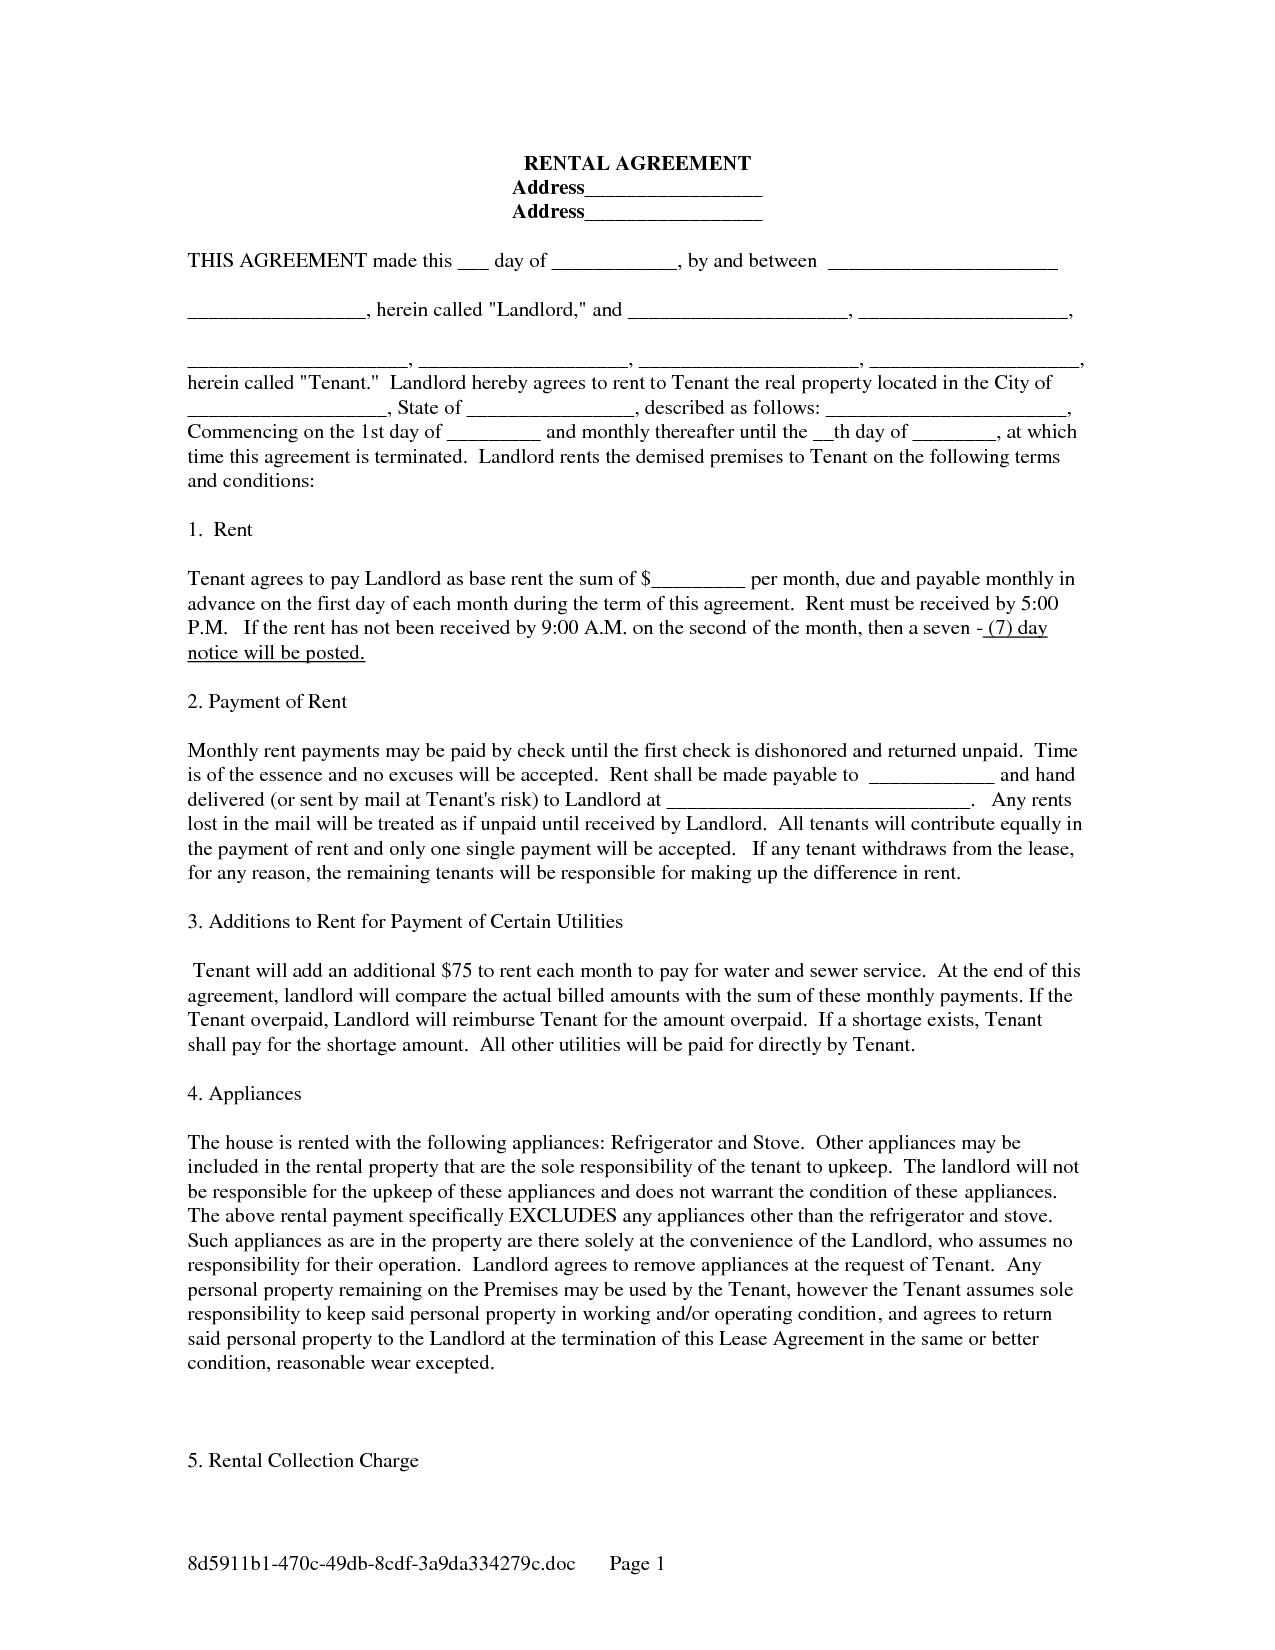 Basic Rental Lease Agreement Filename | down town ken more